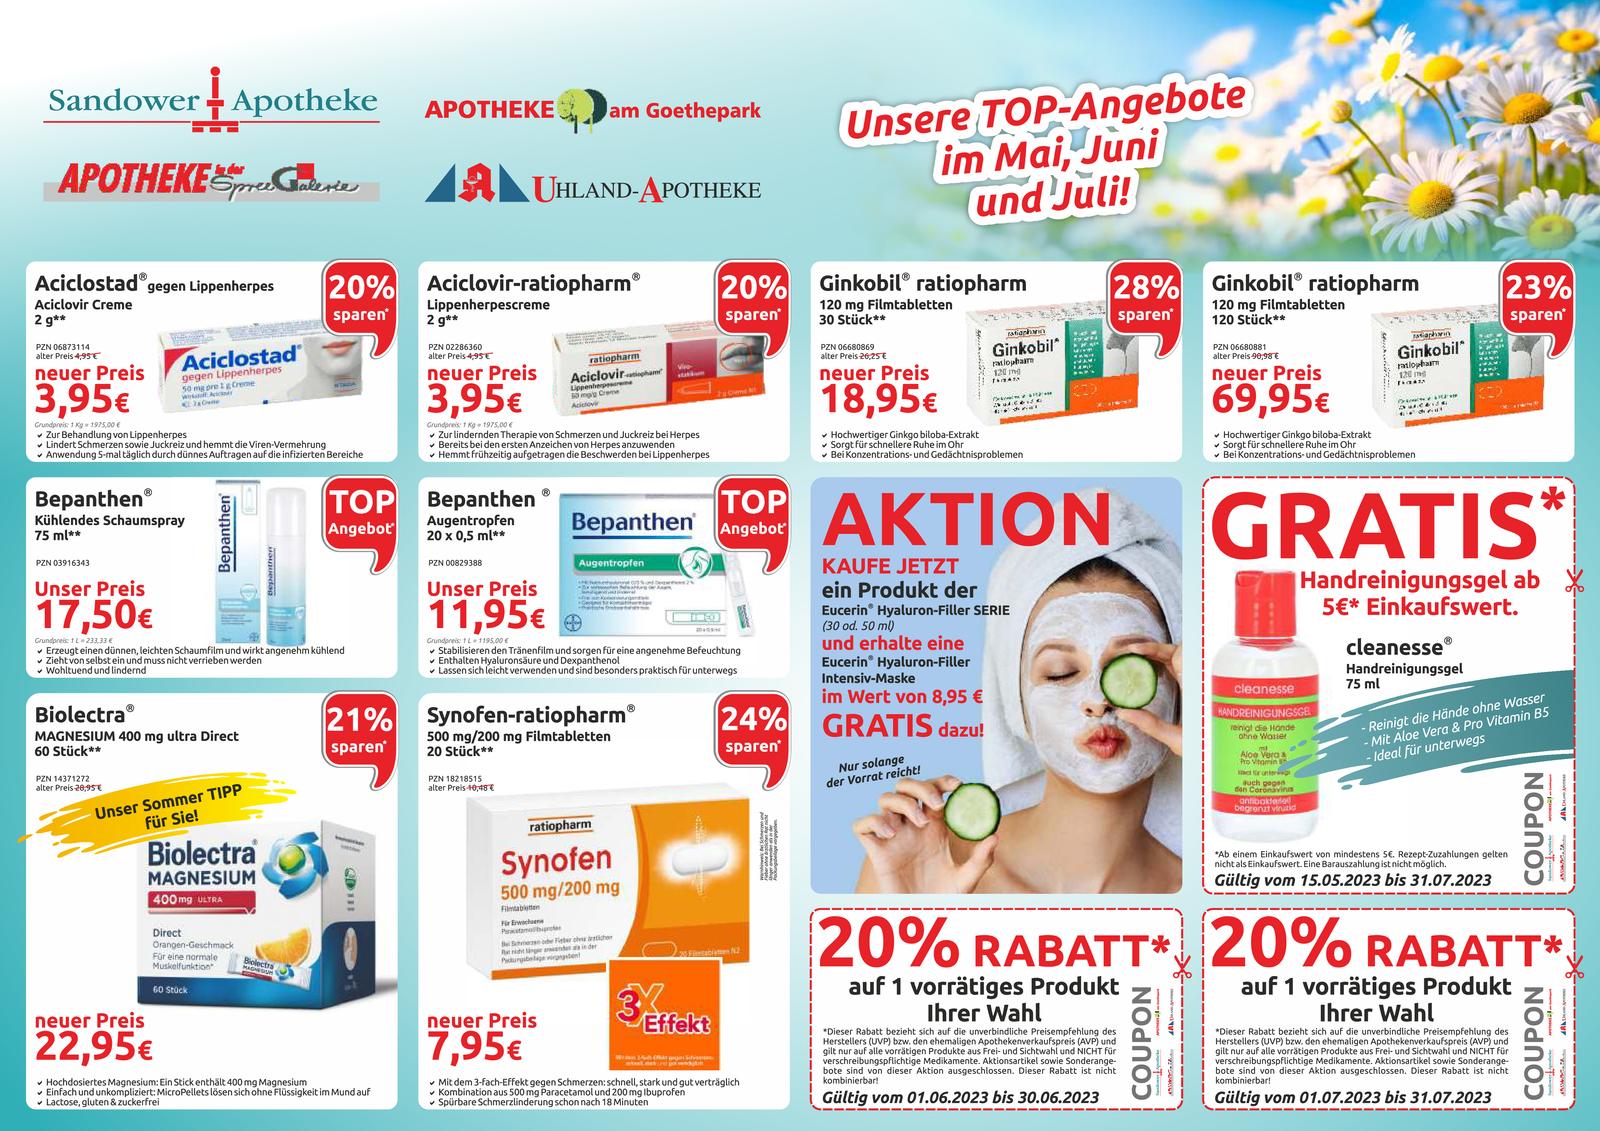 https://mein-uploads.apocdn.net/1274/leaflets/1274_flyer-Seite2.png